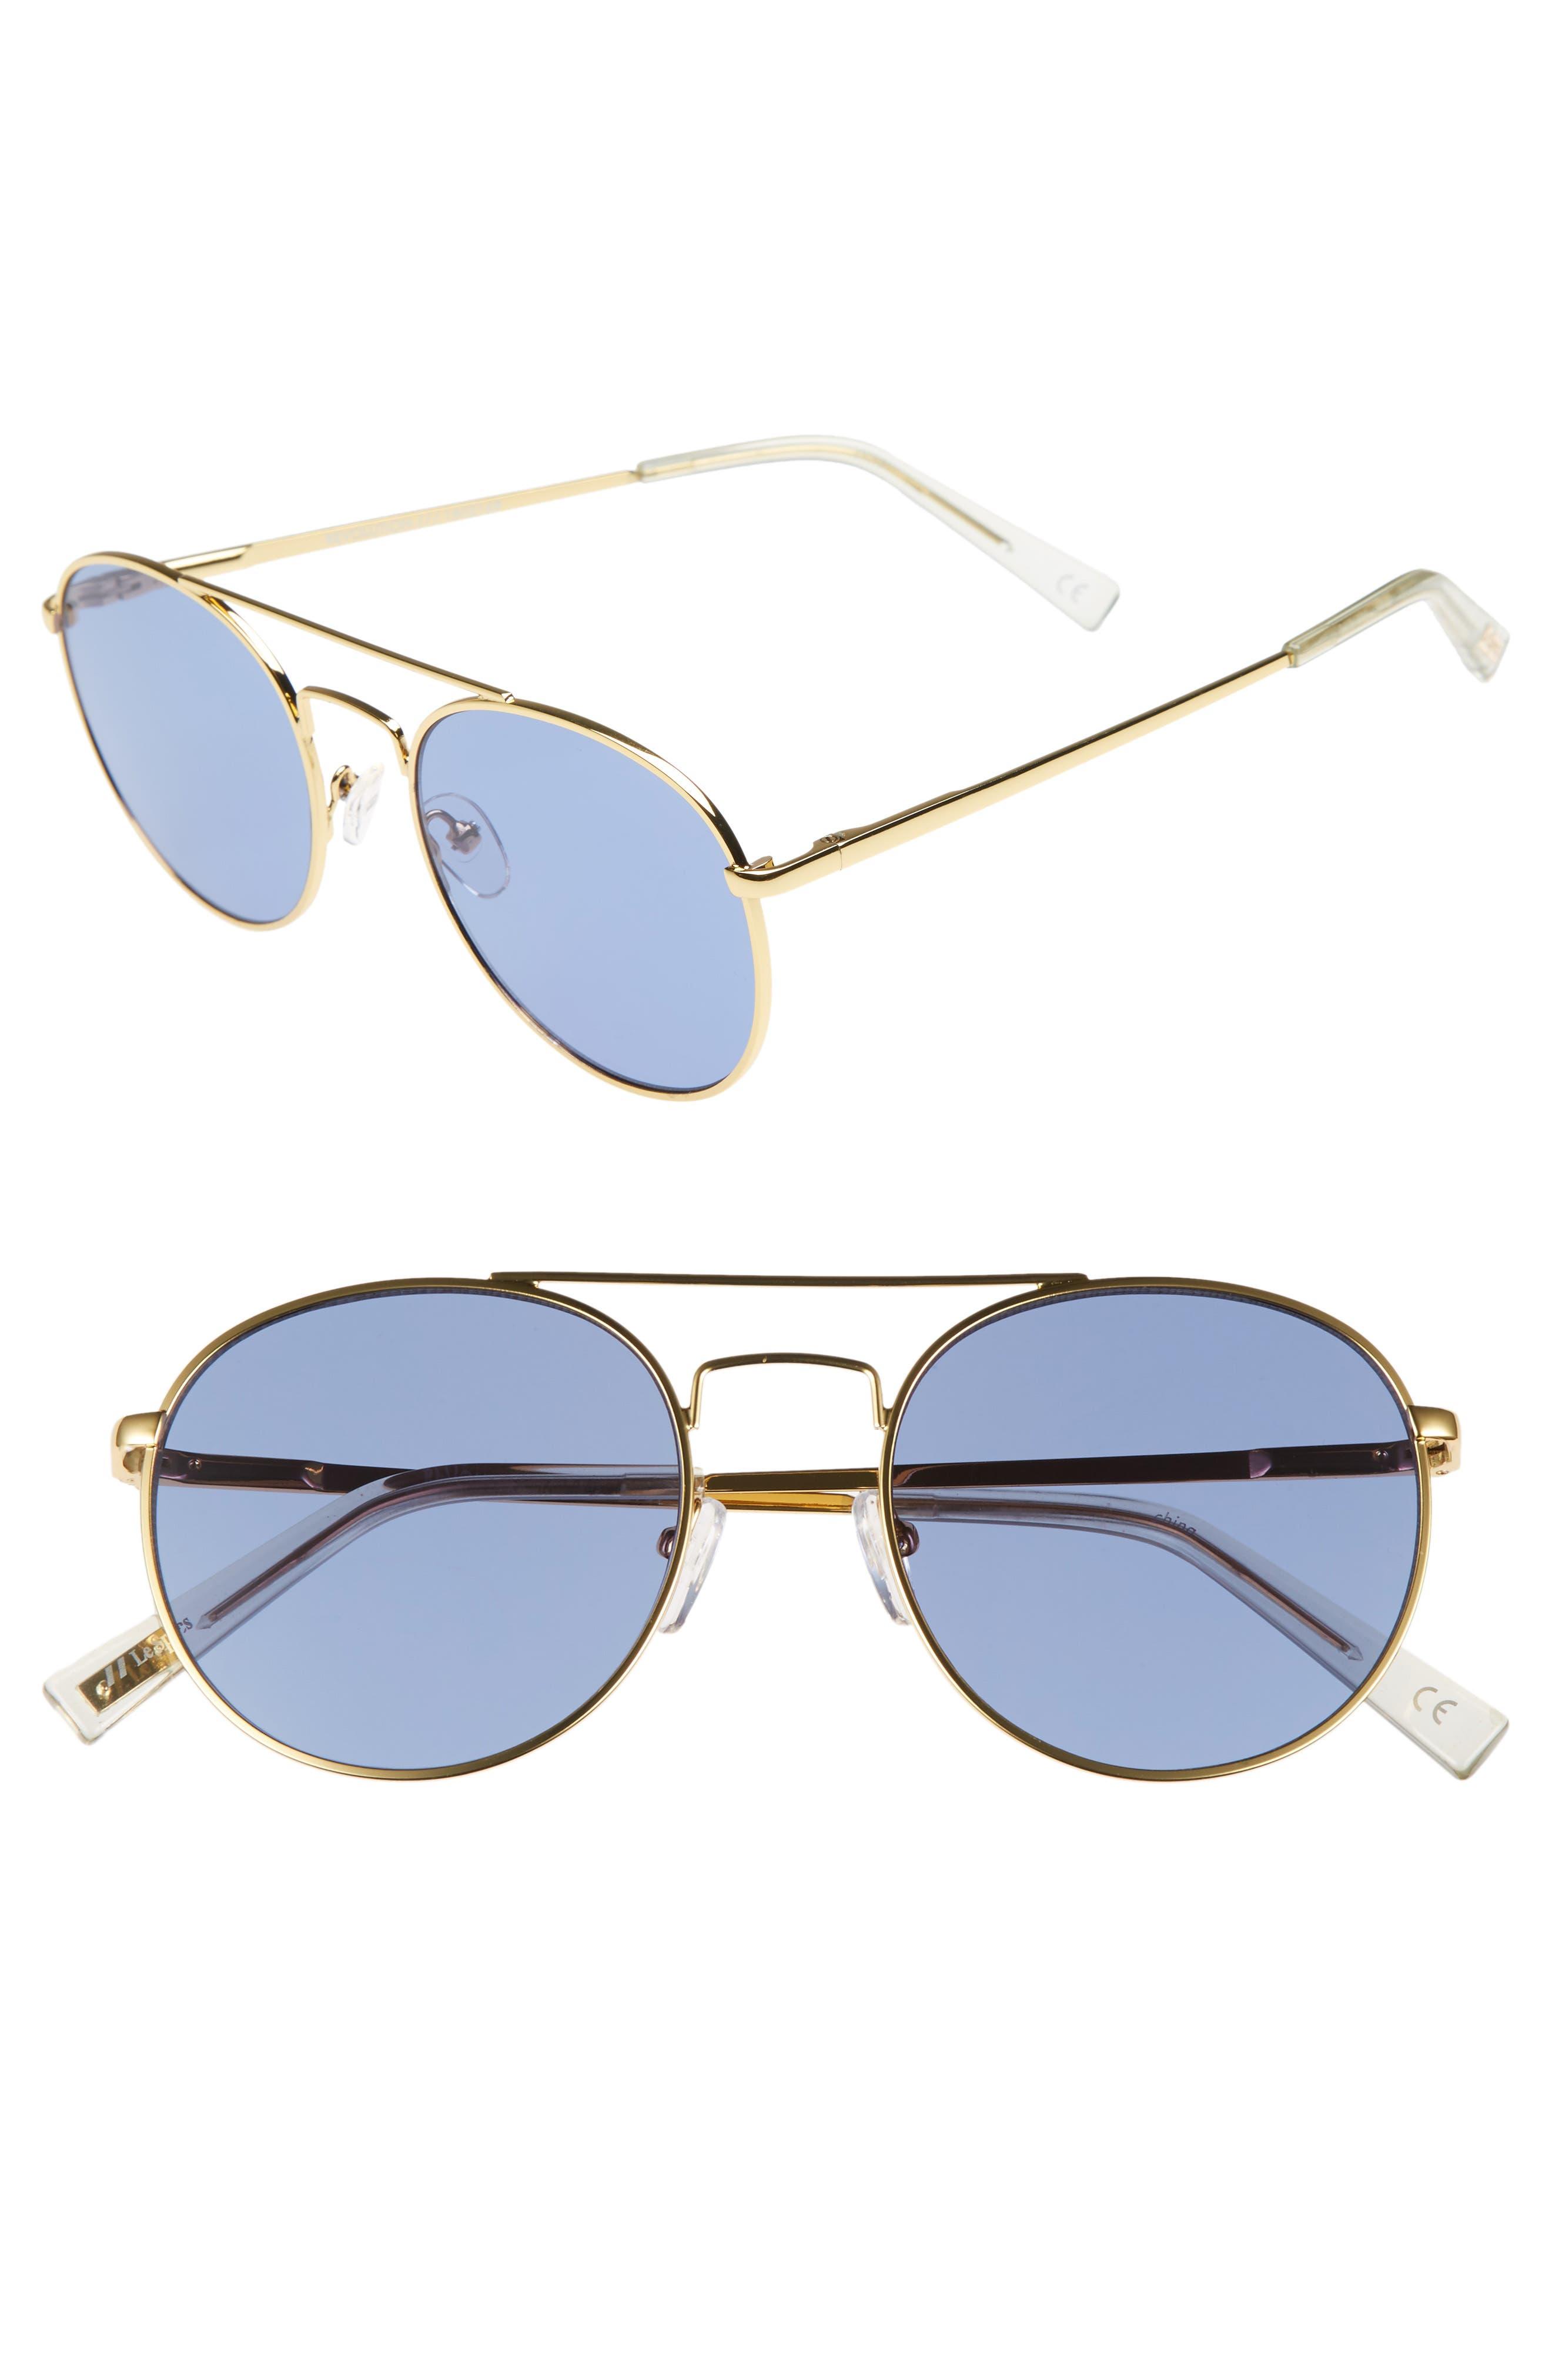 Revolution 53mm Aviator Sunglasses,                         Main,                         color, Bright Gold